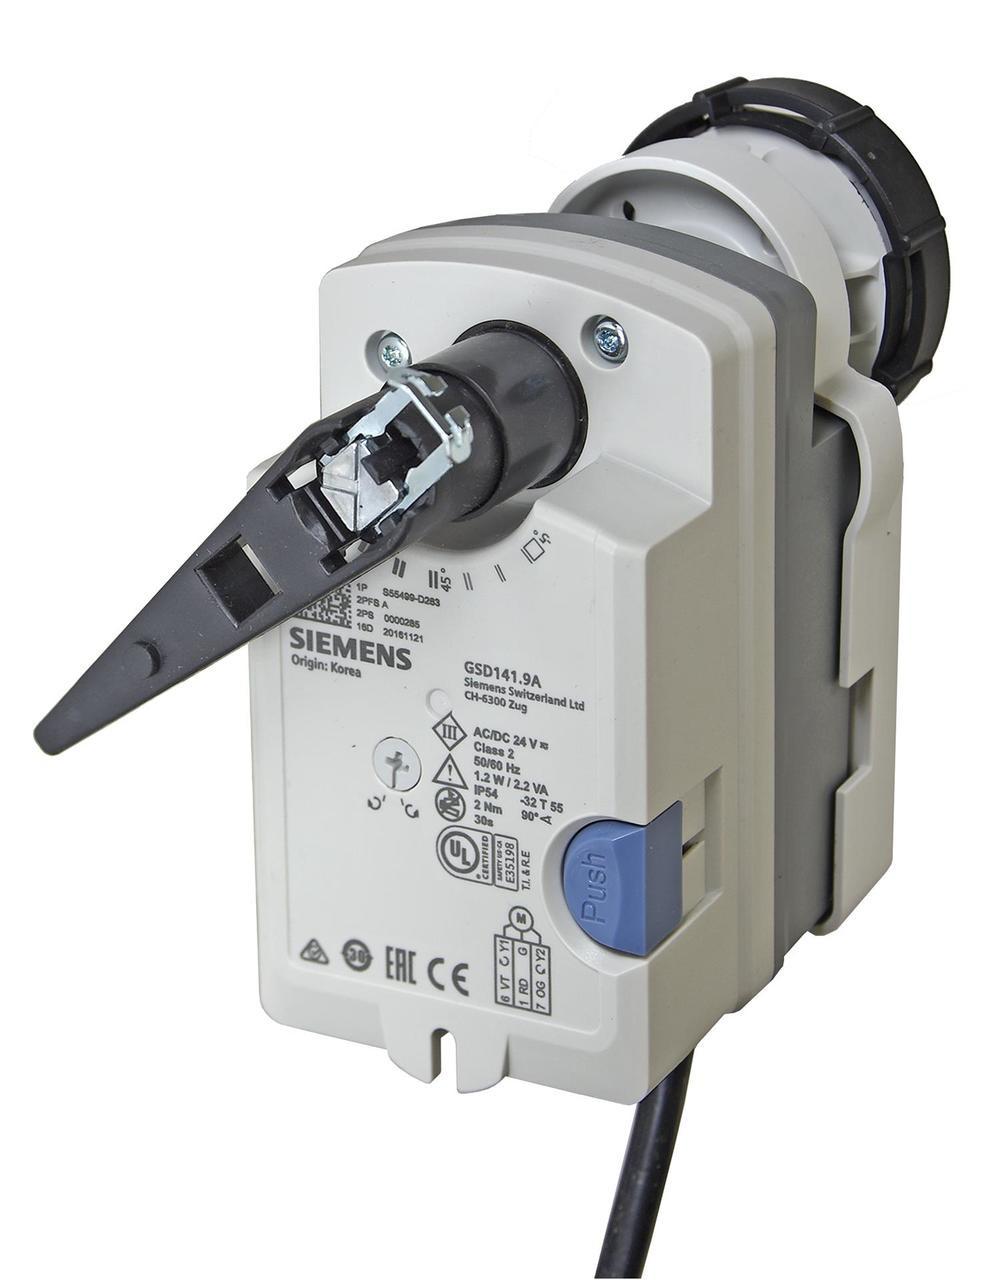 Siemens GSD341.9A rotary actuator